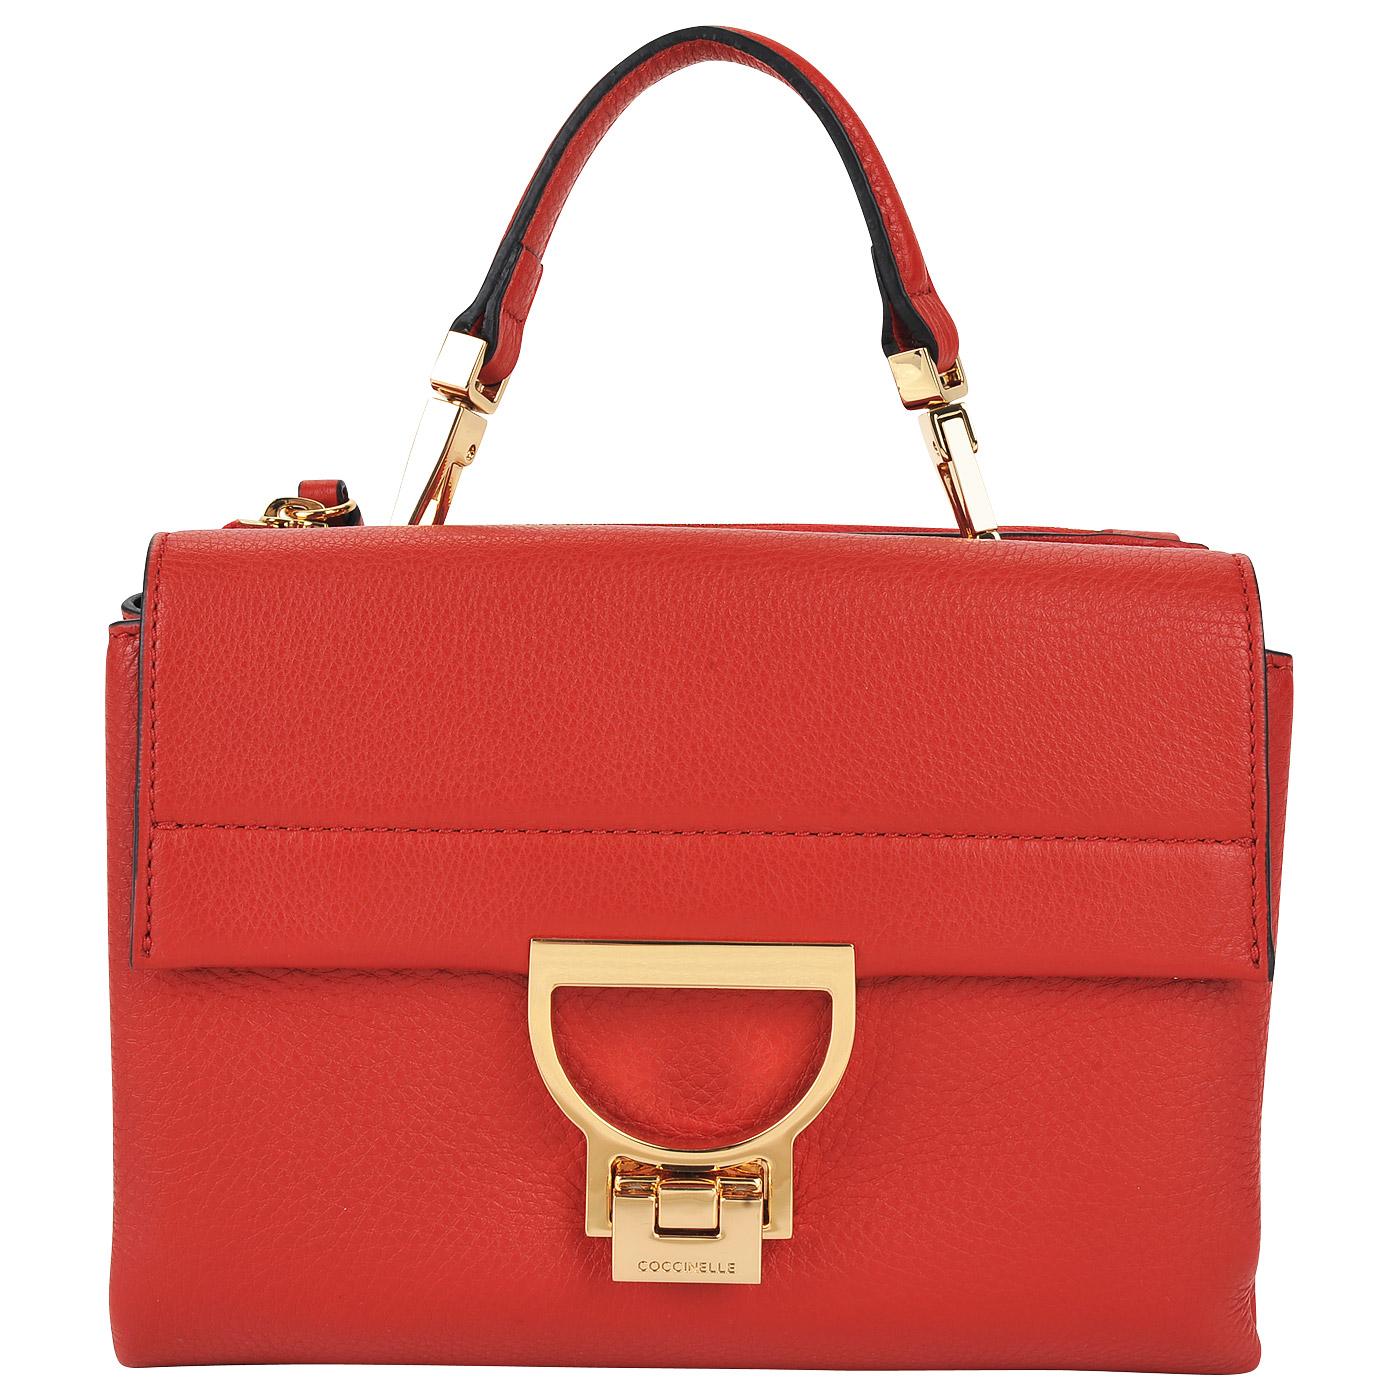 88f34df85ae1 Маленькая кожаная сумка с двумя отделами Coccinelle Arlettis BD5 55 ...